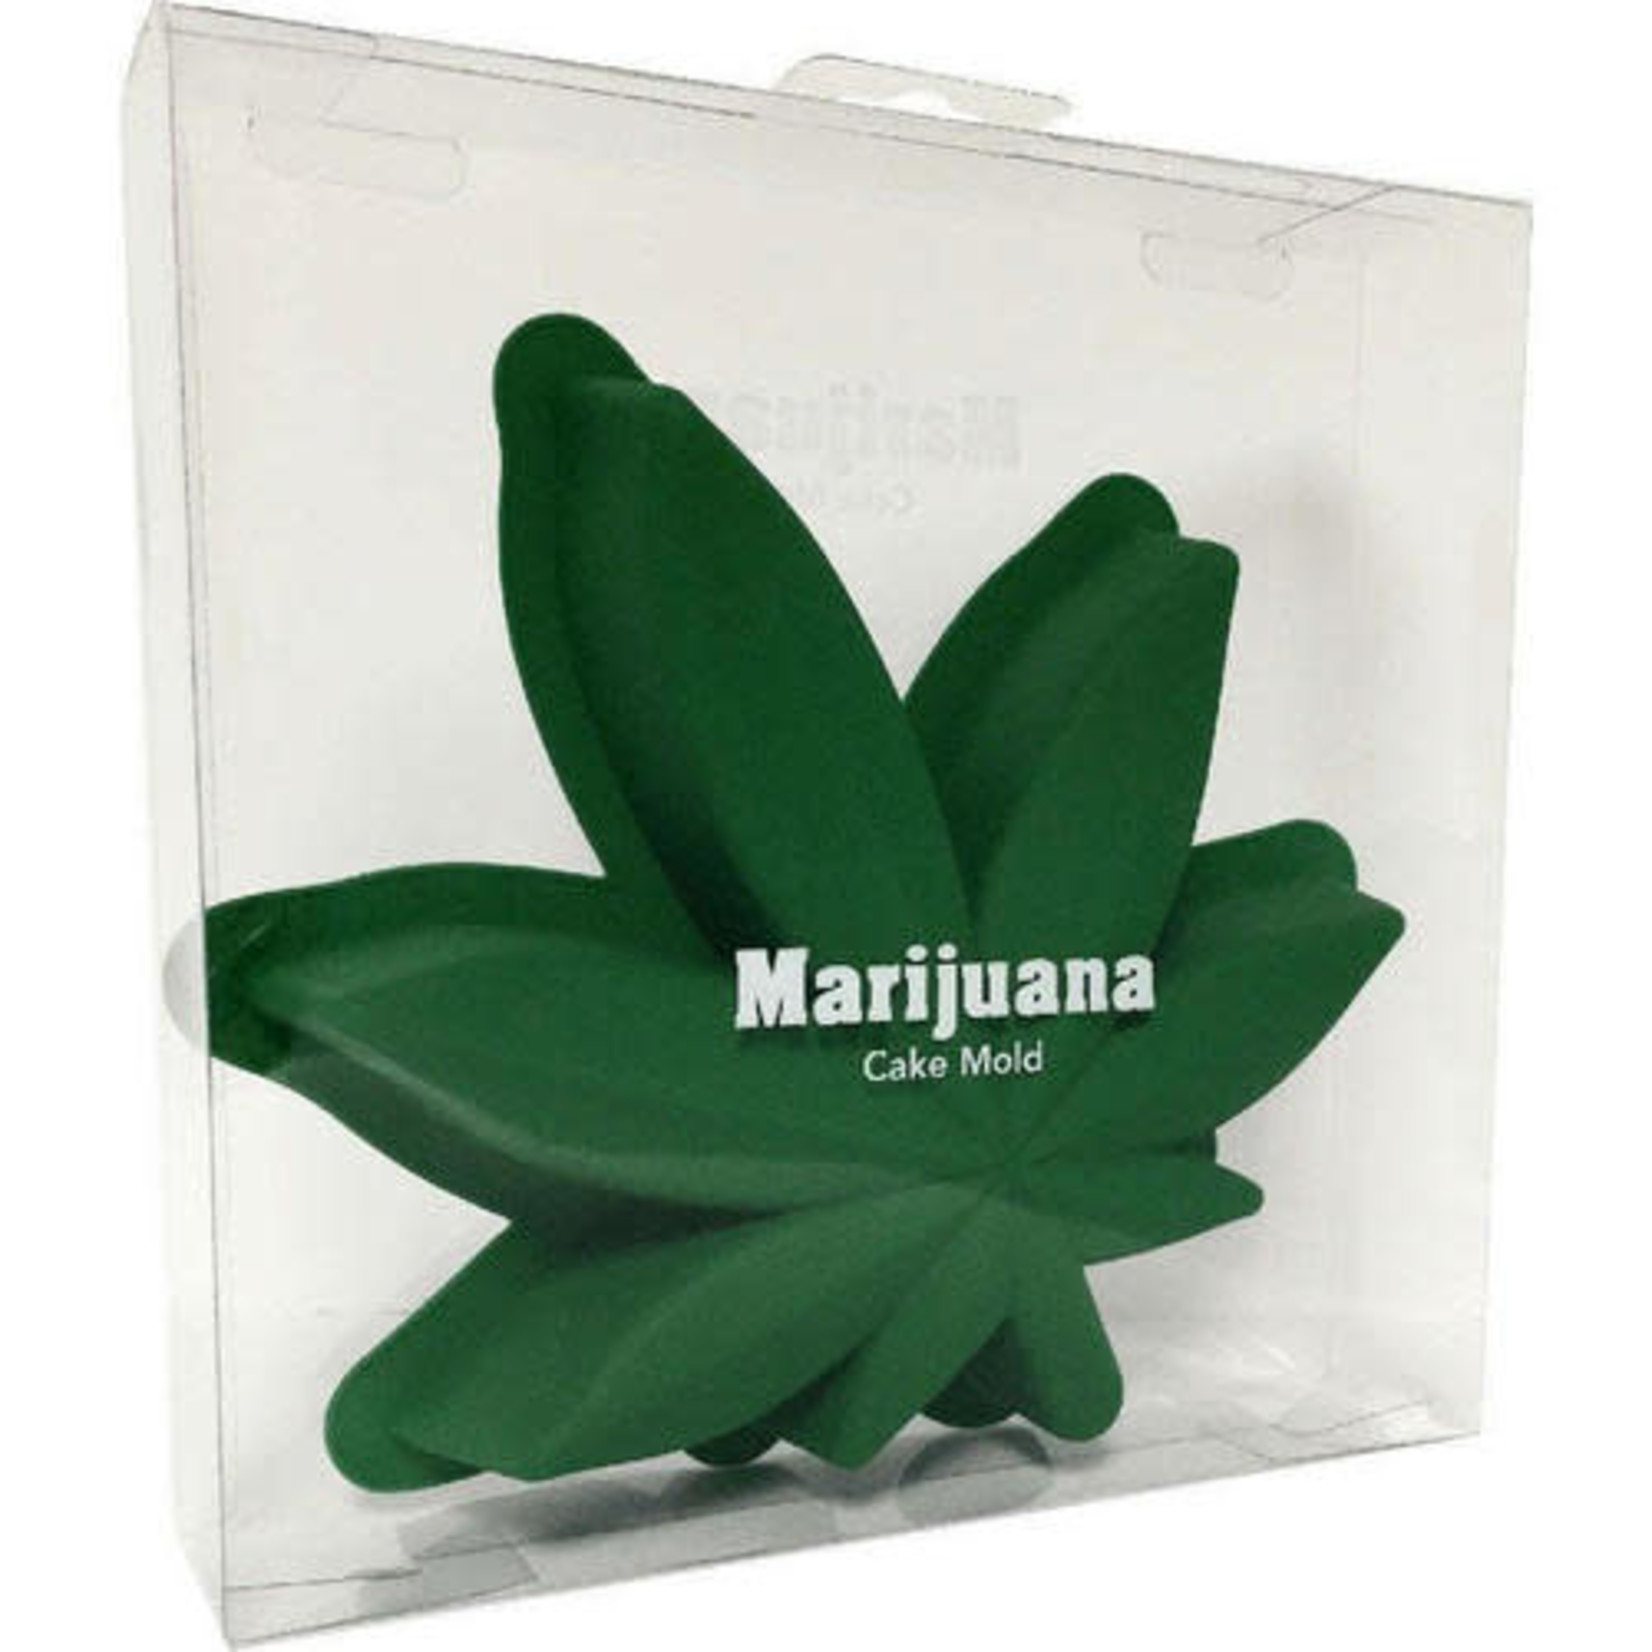 Cake Molds - Marijuana Leaf